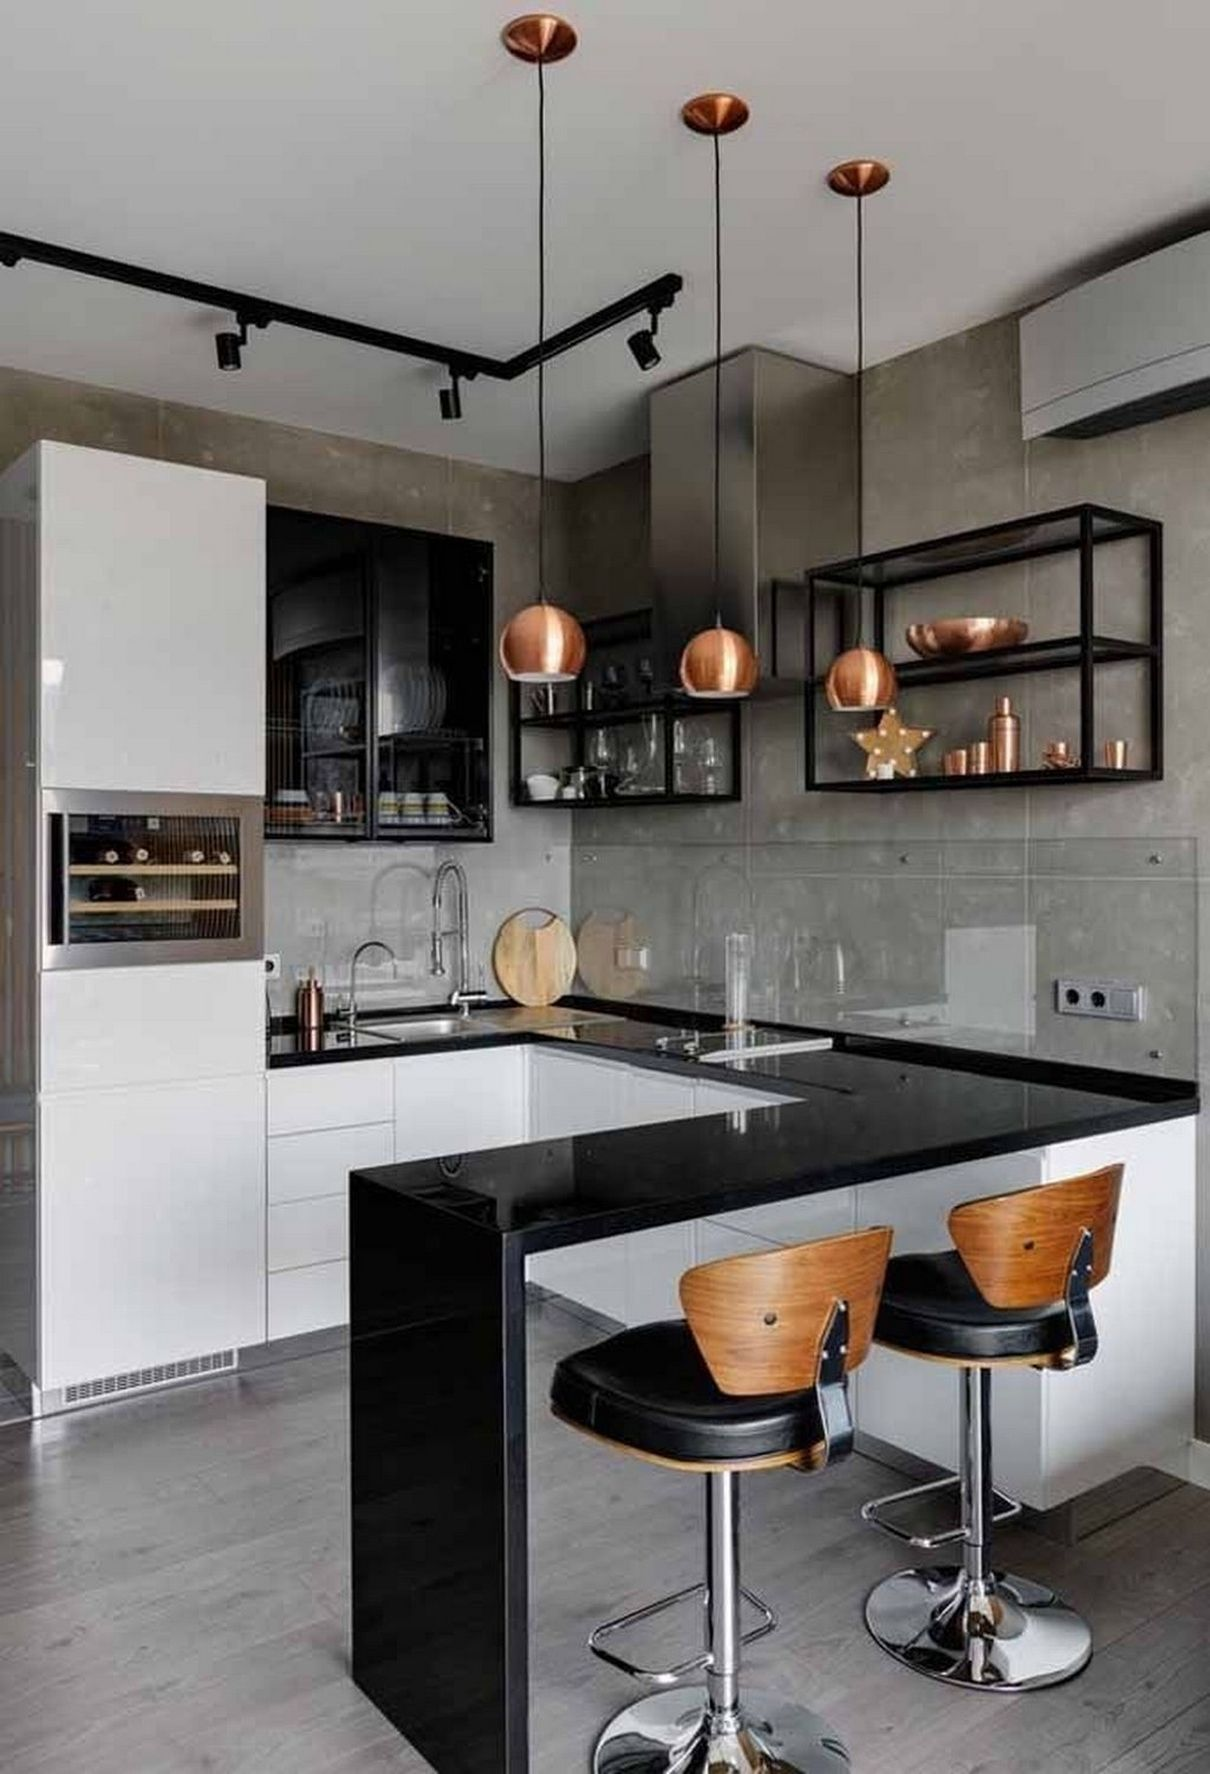 20 kitchen design ideas that look elegant and luxurious find here tips kitchen remodel ideas on kitchen ideas elegant id=91476